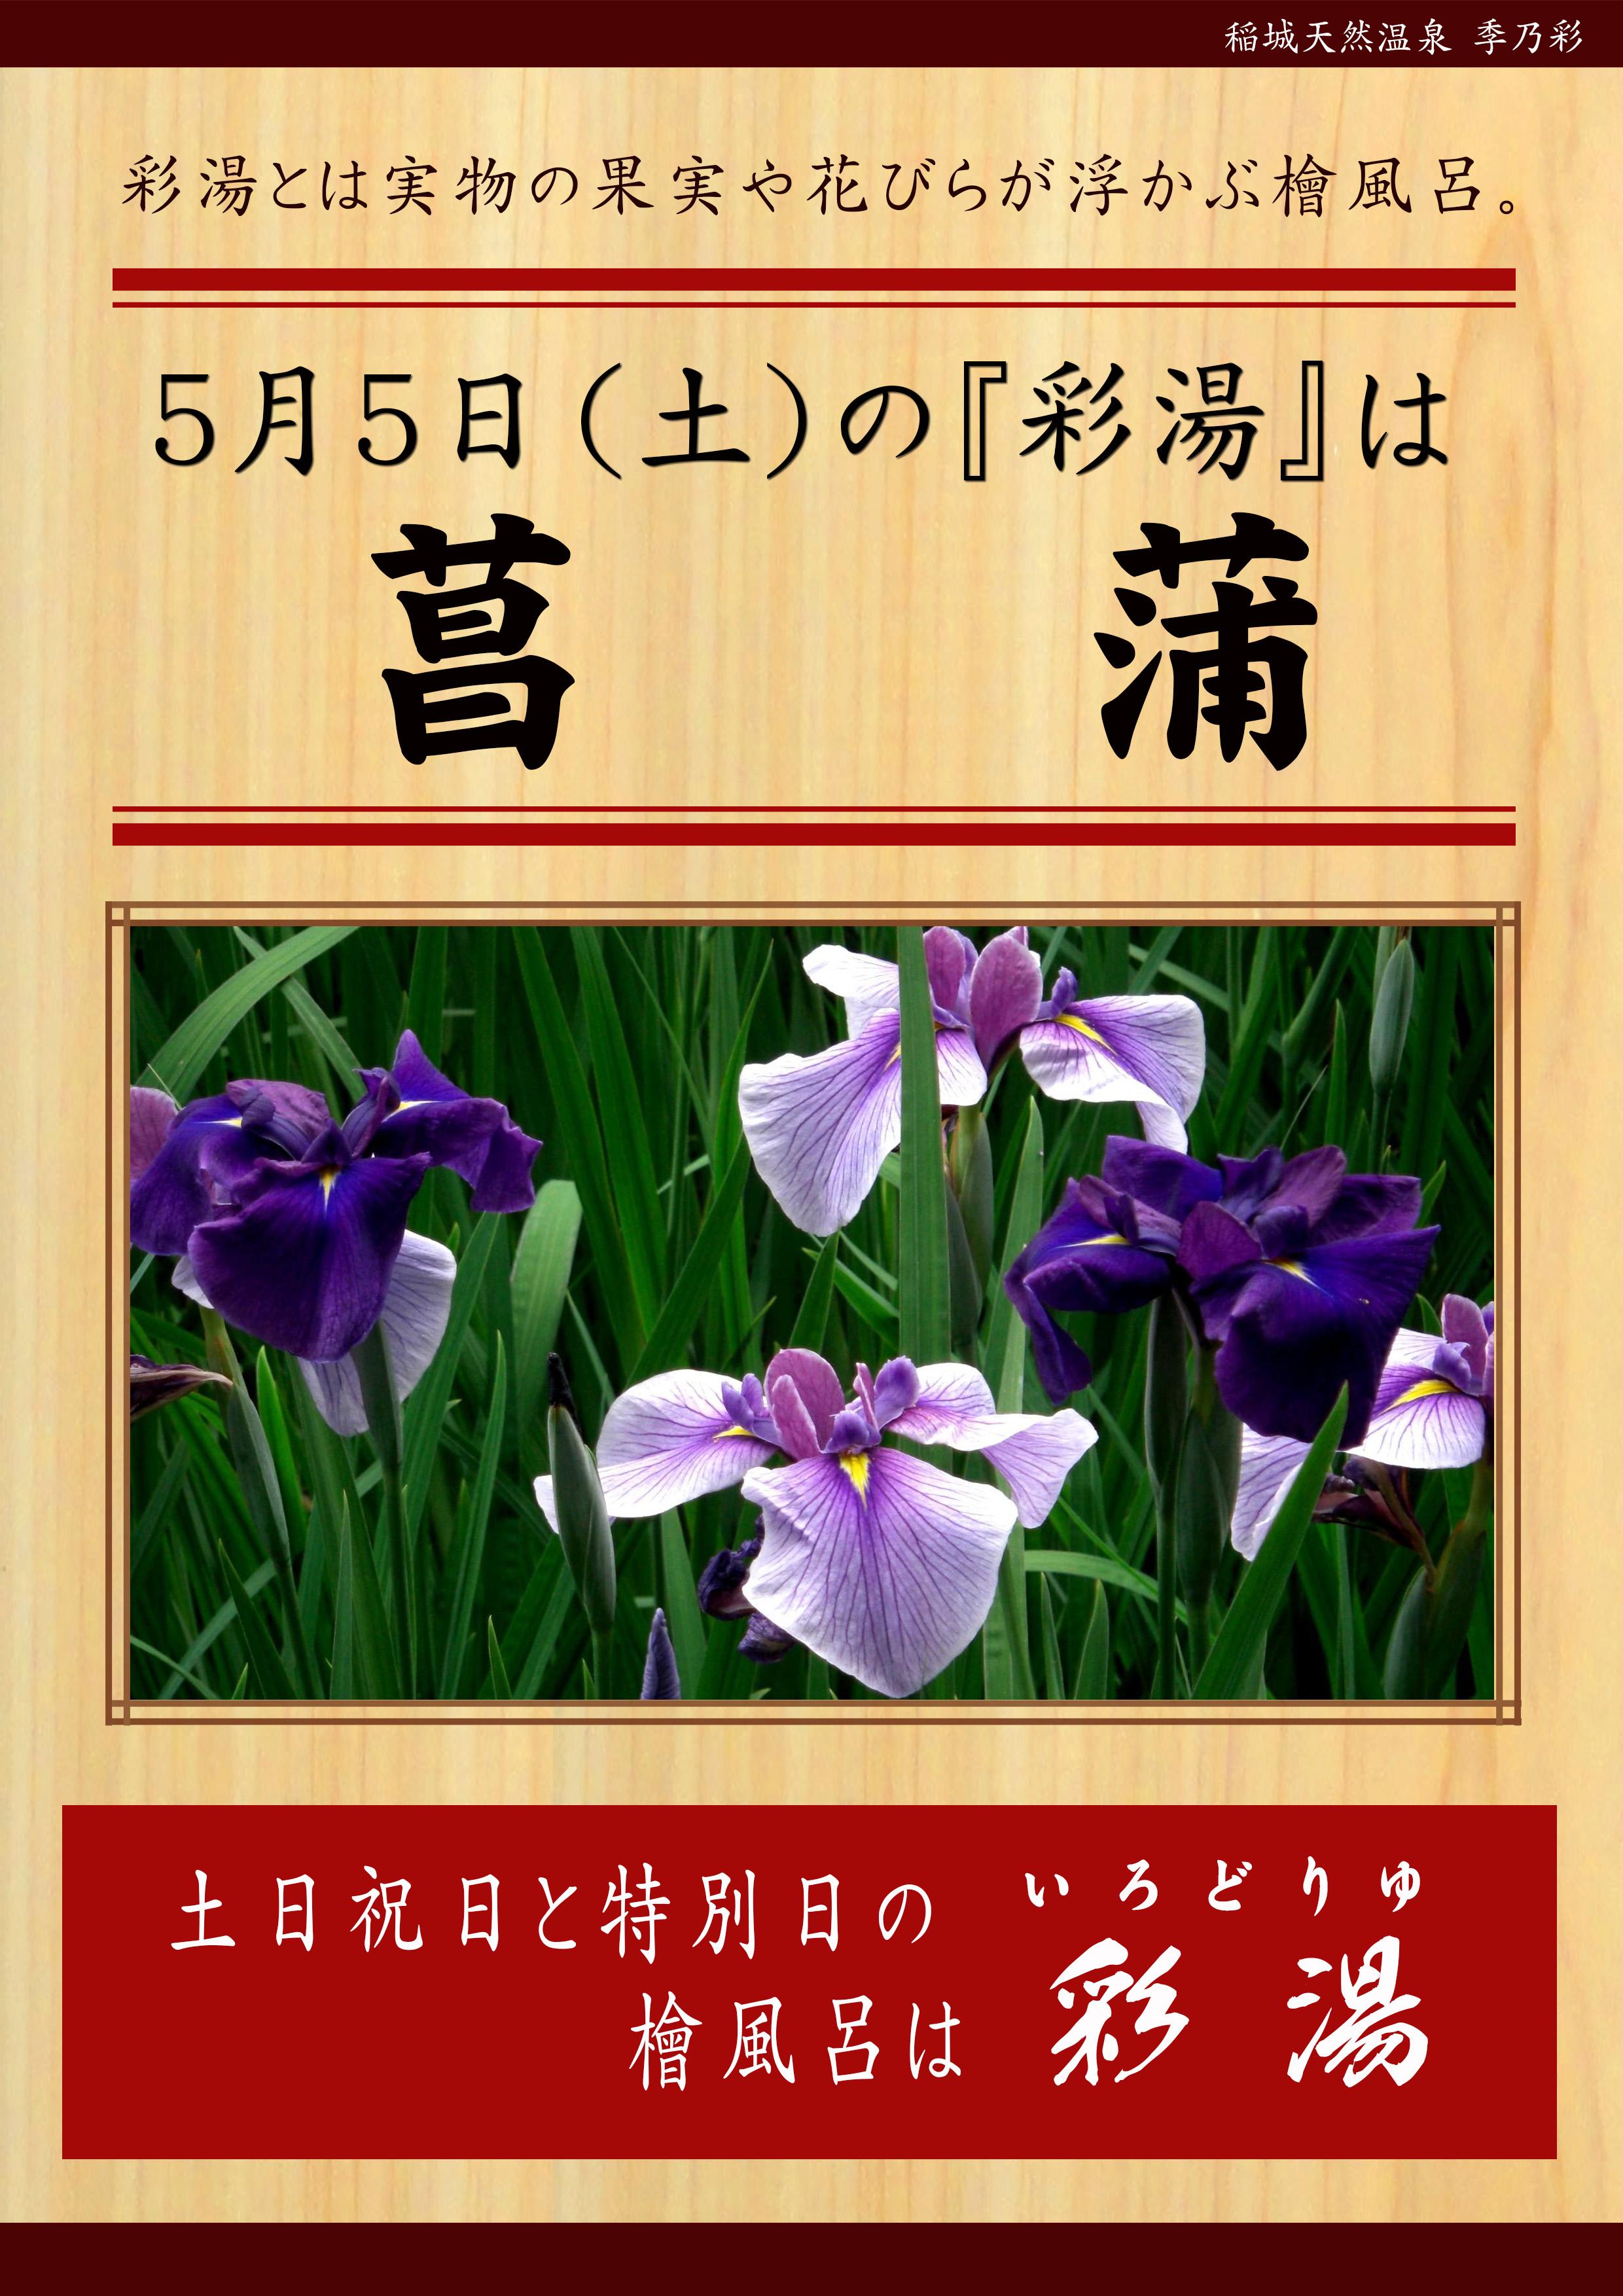 20180505POP イベント 彩湯 男湯 菖蒲